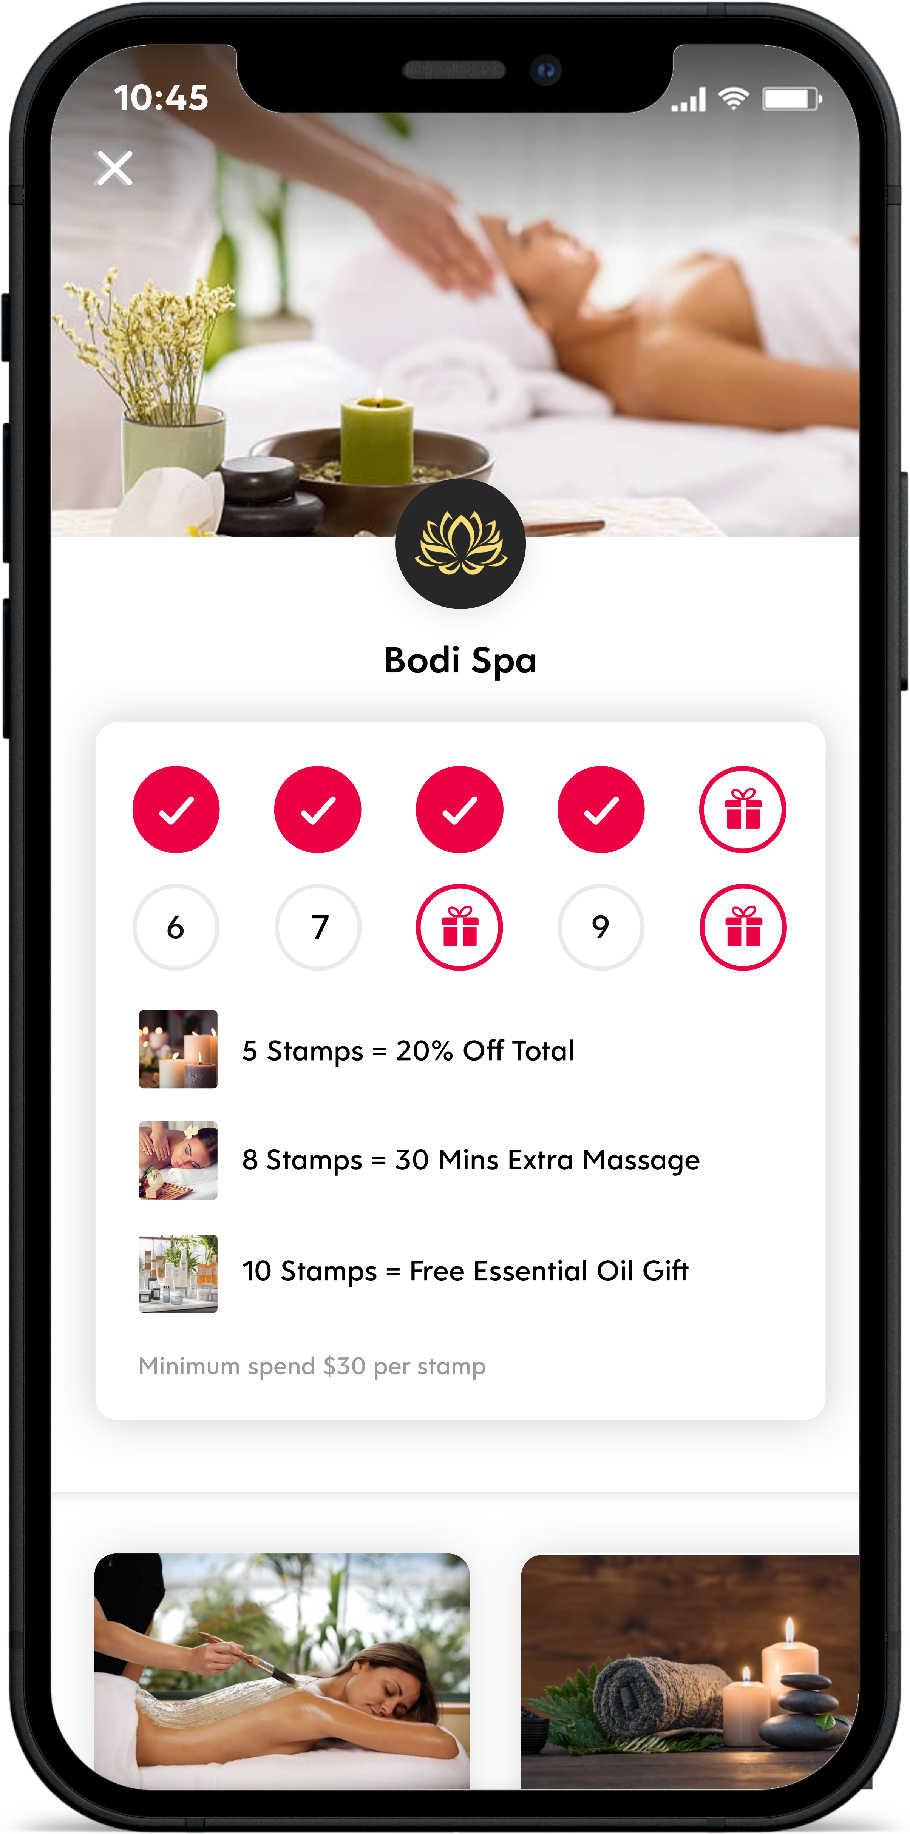 Screenshot of Flex Rewards Digital Loyalty Card for Bodi Spa on White Background